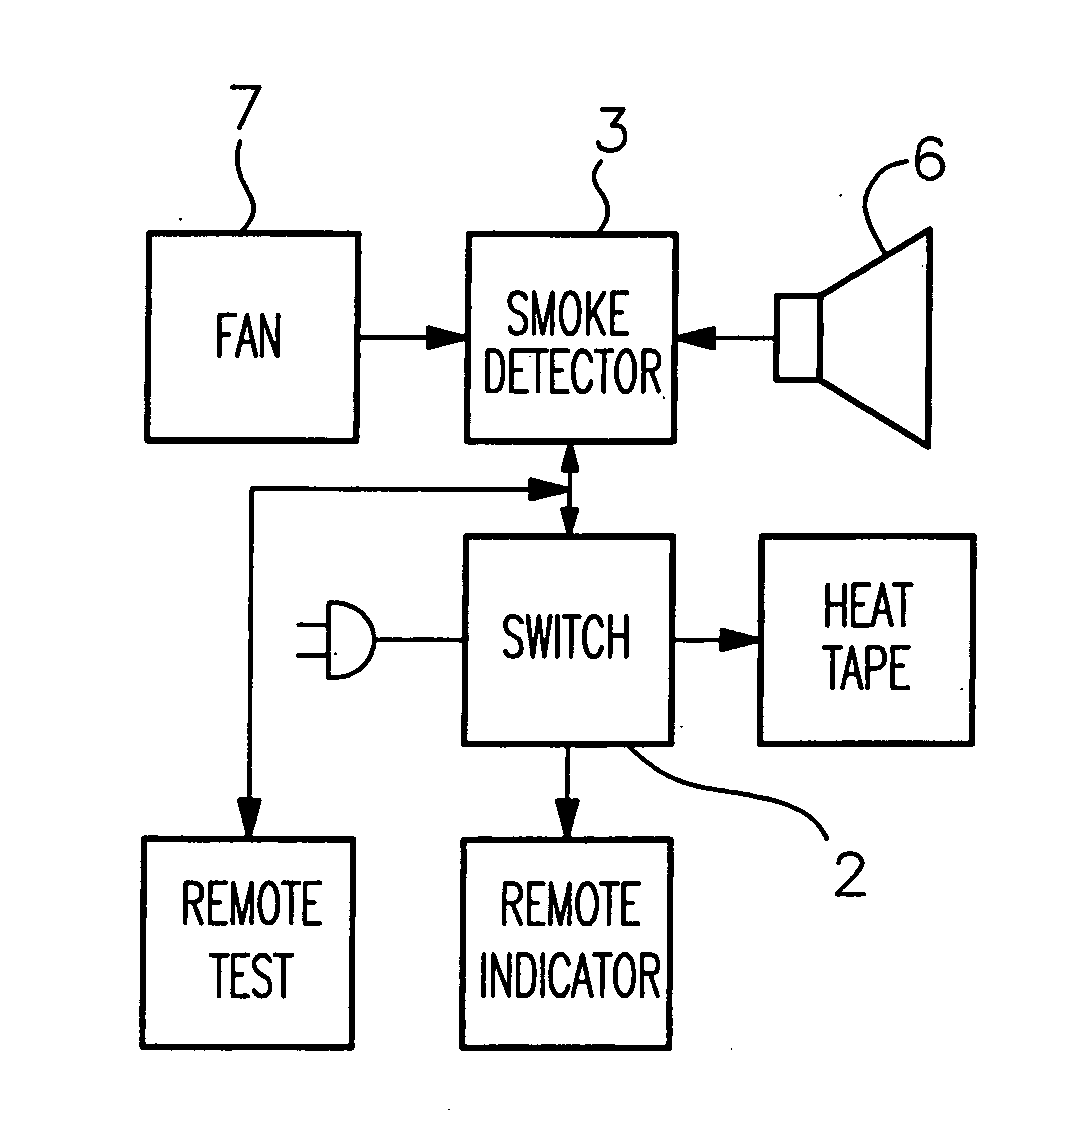 patent us20070001865 - smoke detector